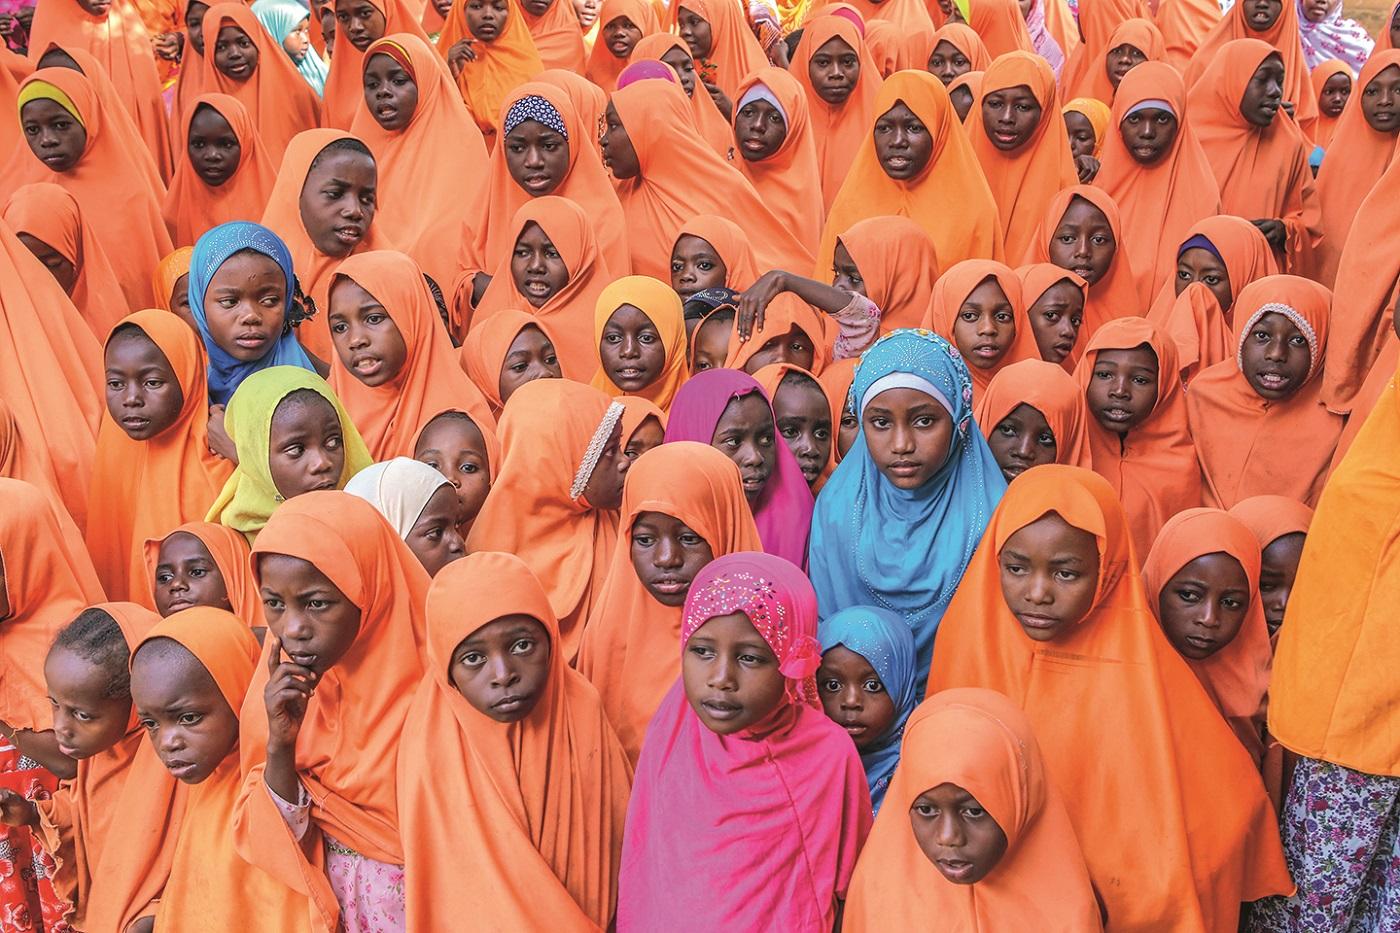 ZANZIBAR, TANZANIA - SEPTEMBER 14: Tanzanians wait to welcome as volunteers of